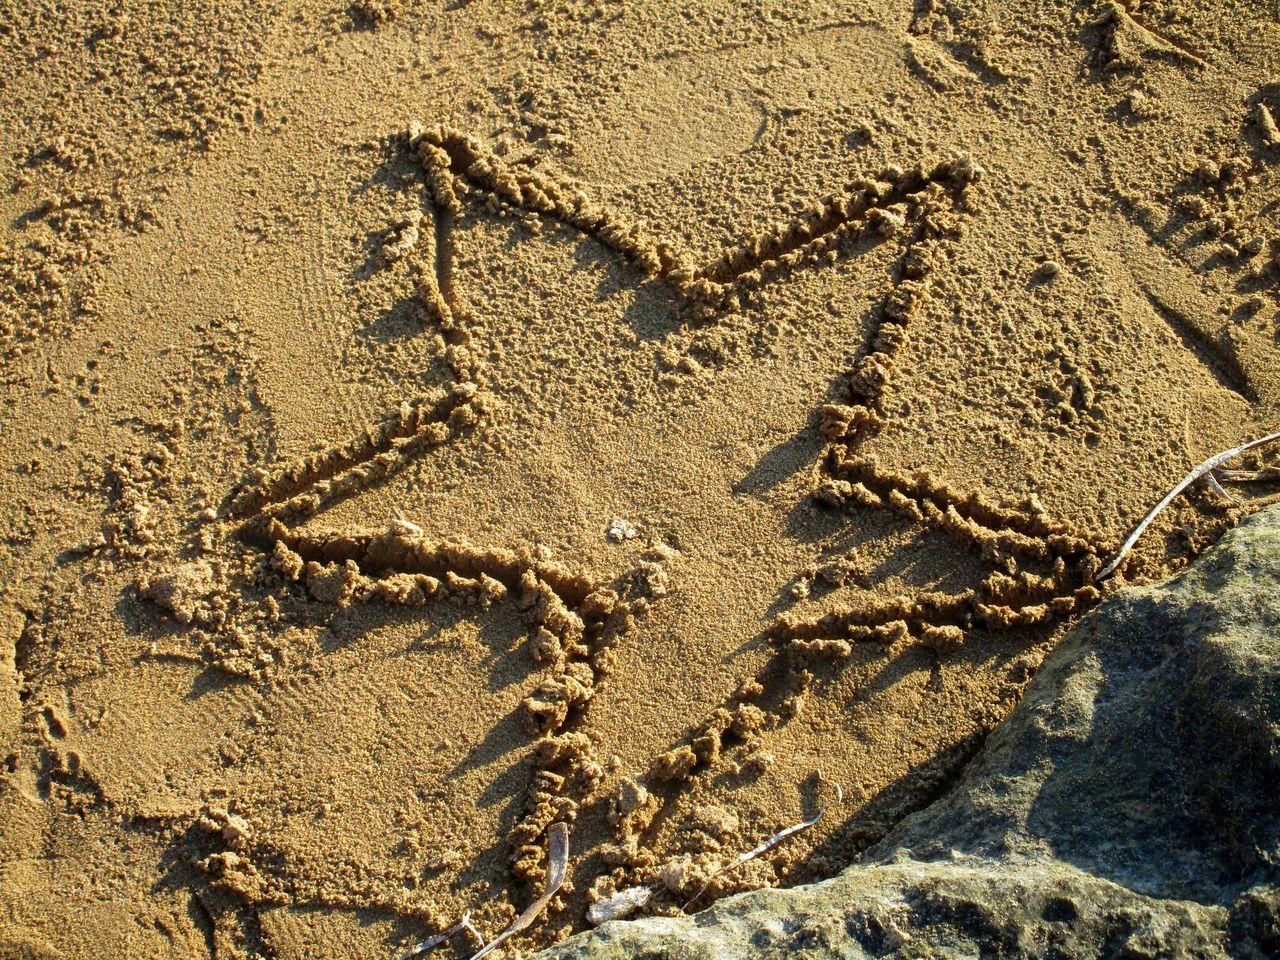 Beach Sand Sand Star Sea Sea Sand Showcase March Showcase: March Star Winter 43 Golden Moments